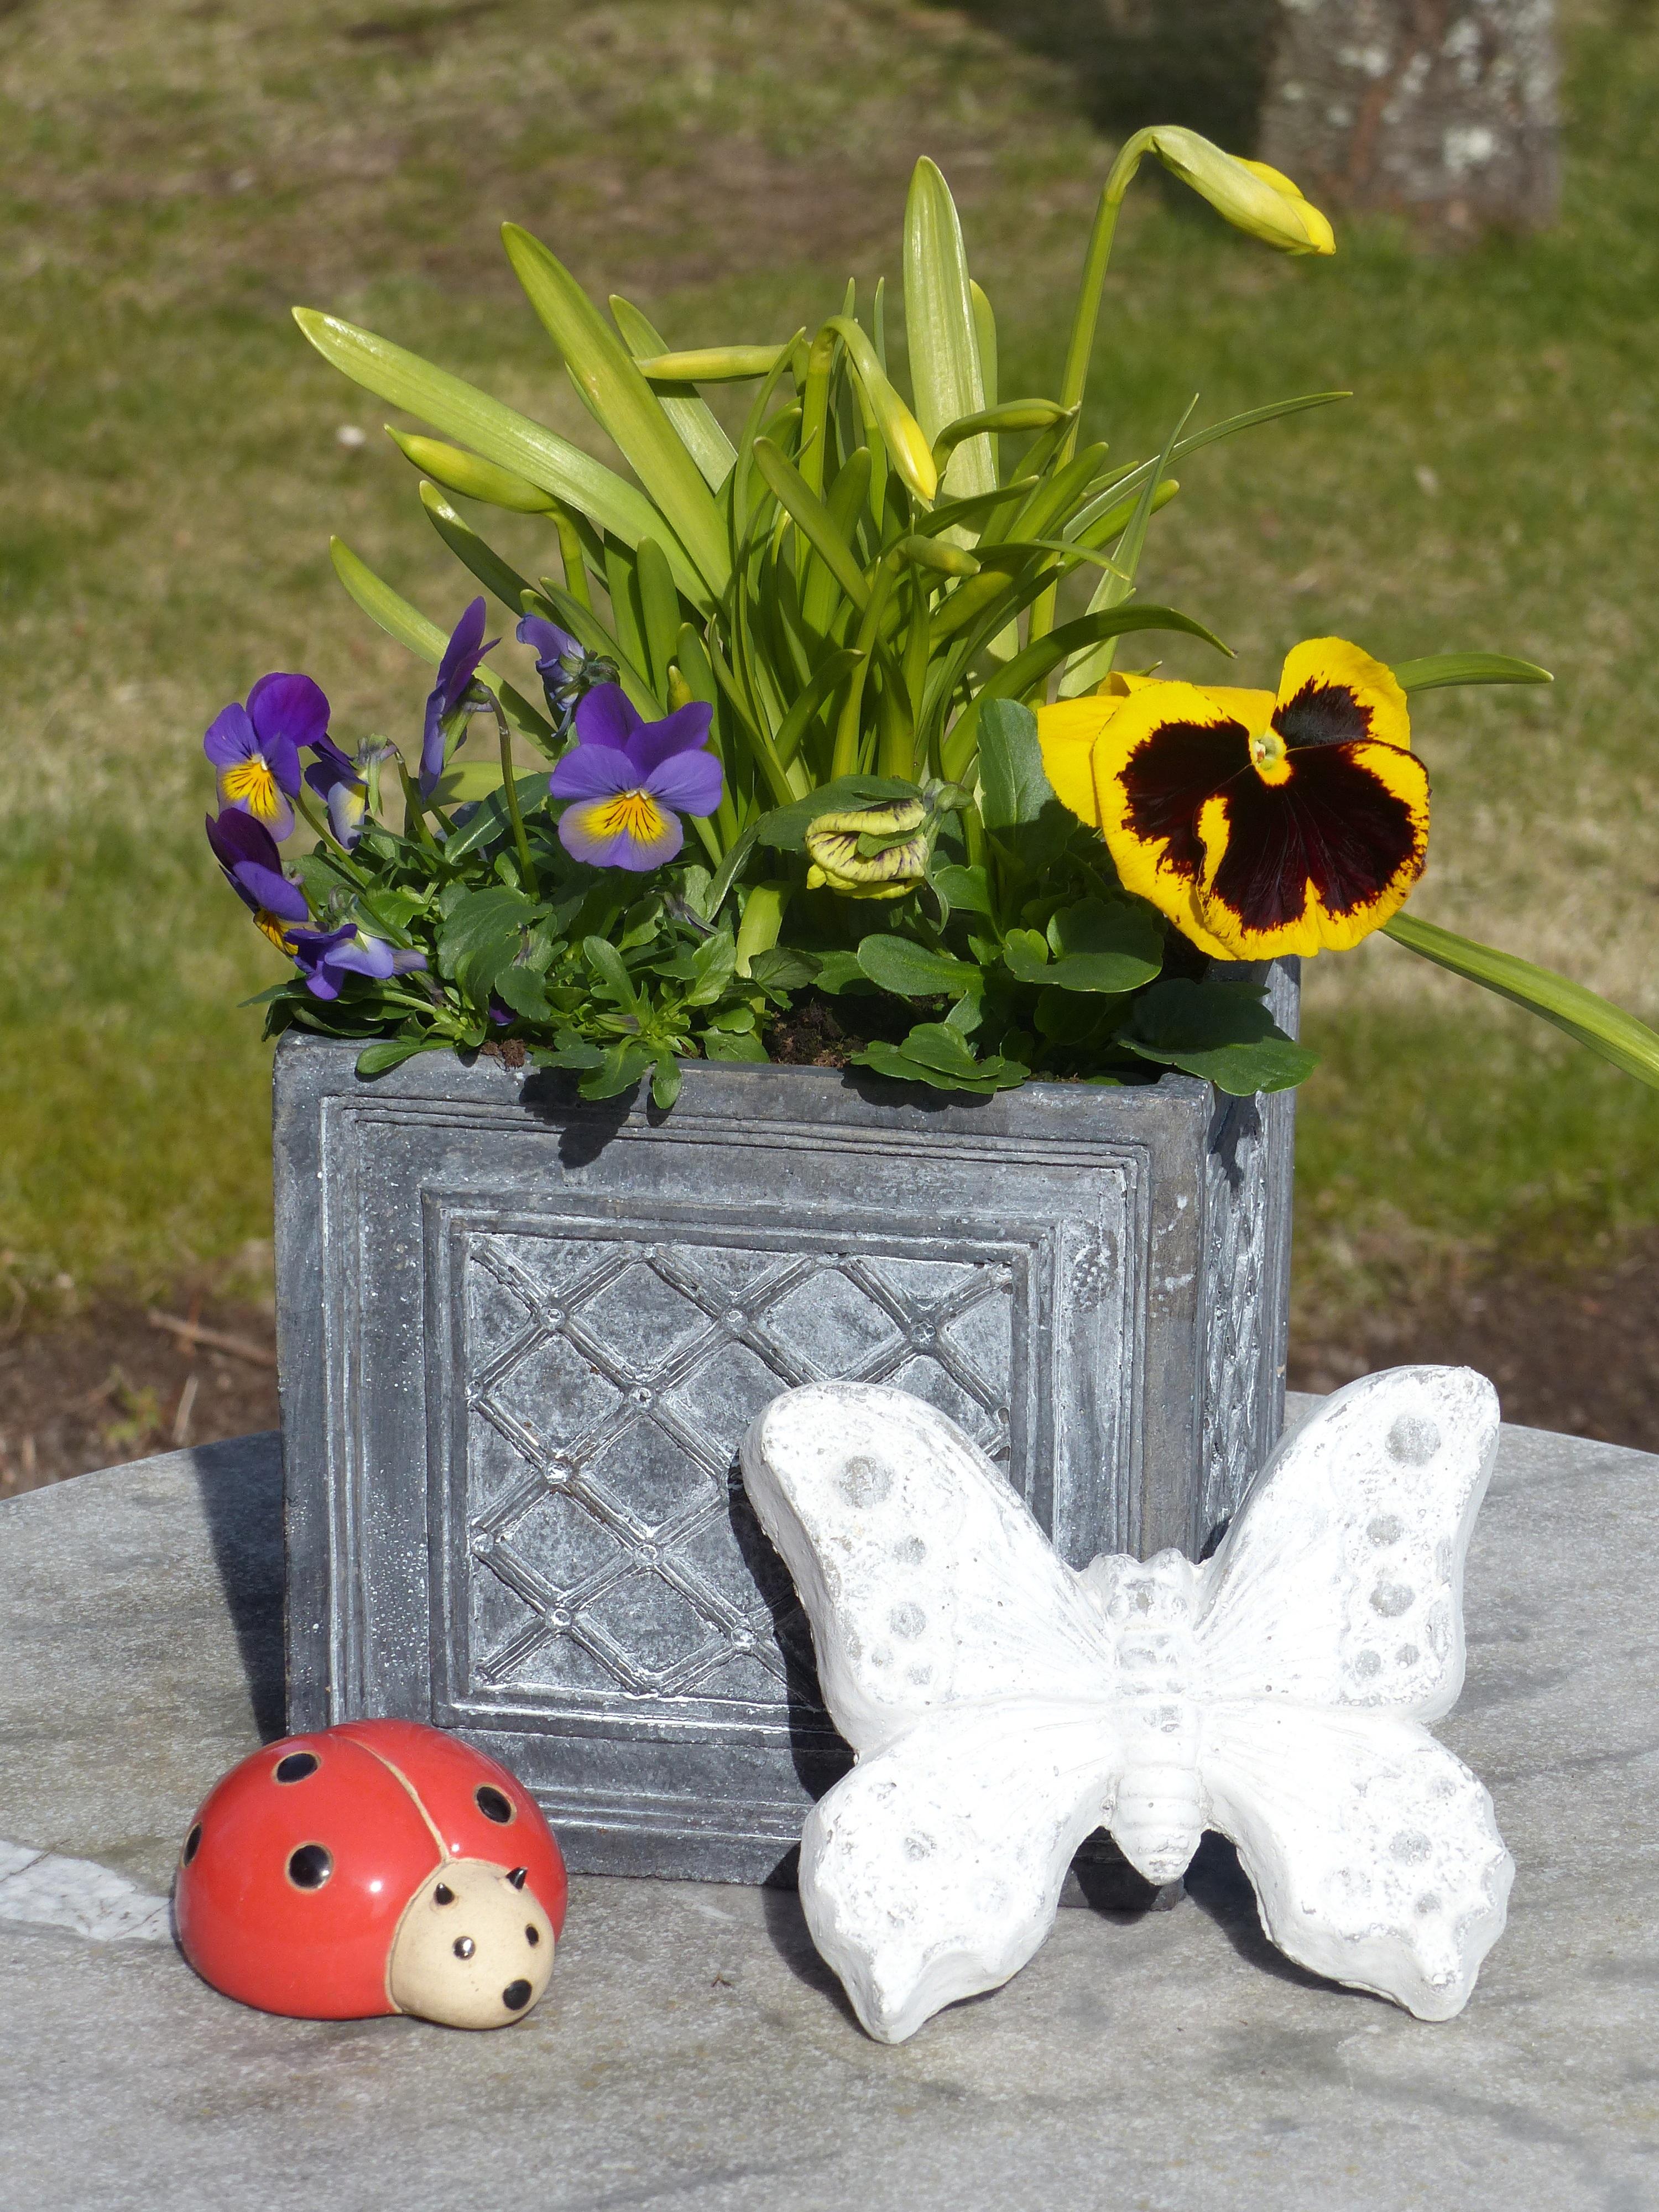 Букет астана букет цветы божья коровка тюльпаны